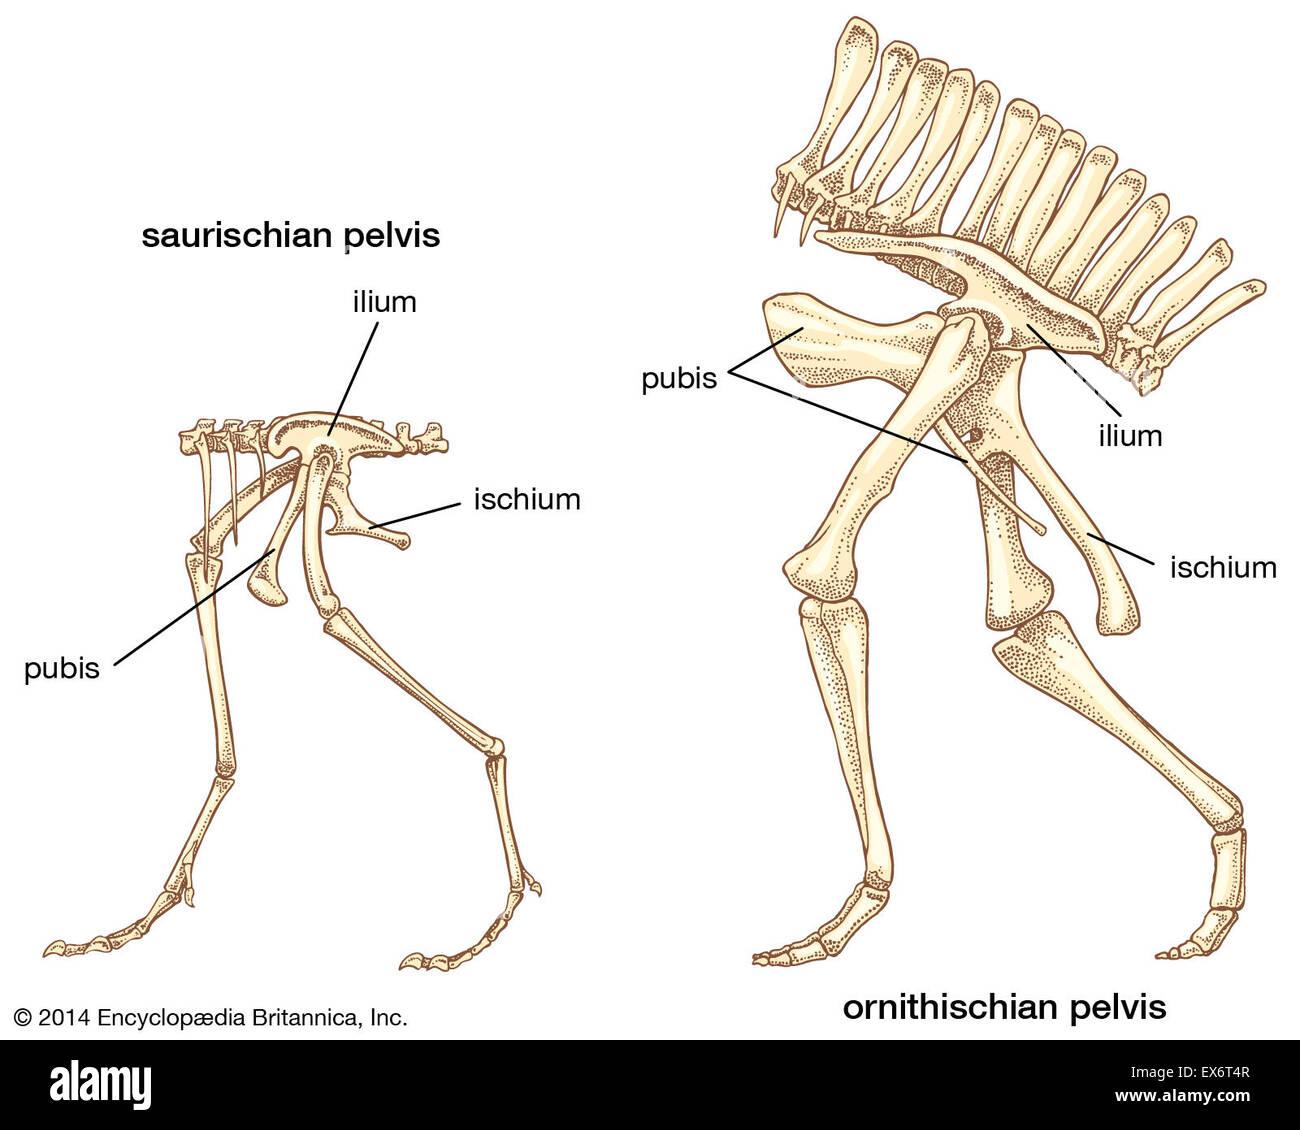 Dinosaur pelvic structures - Stock Image